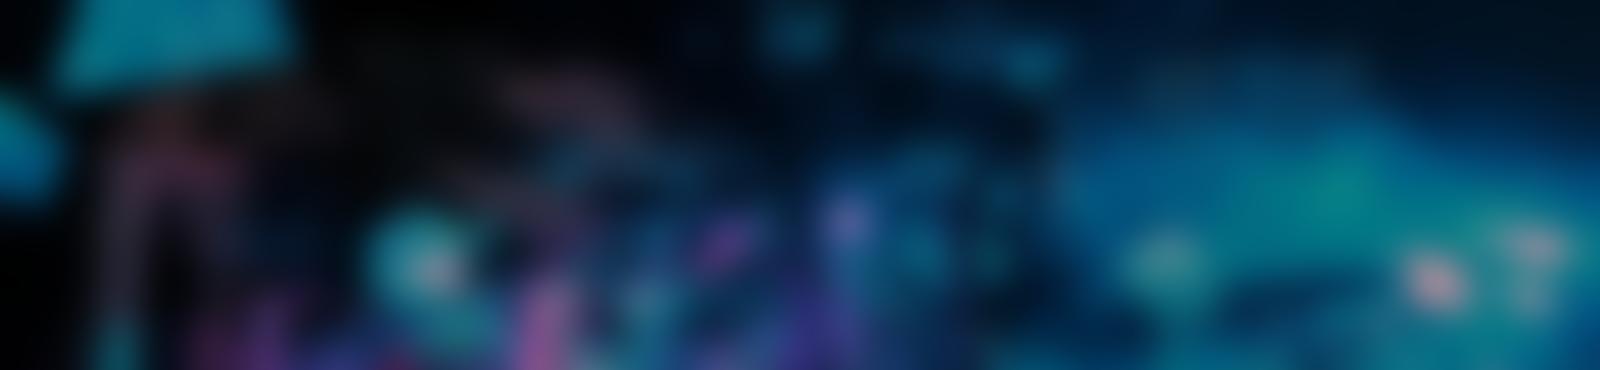 Blurred 5dade130 631a 4e5e 8d8c bee40d5ba7dd